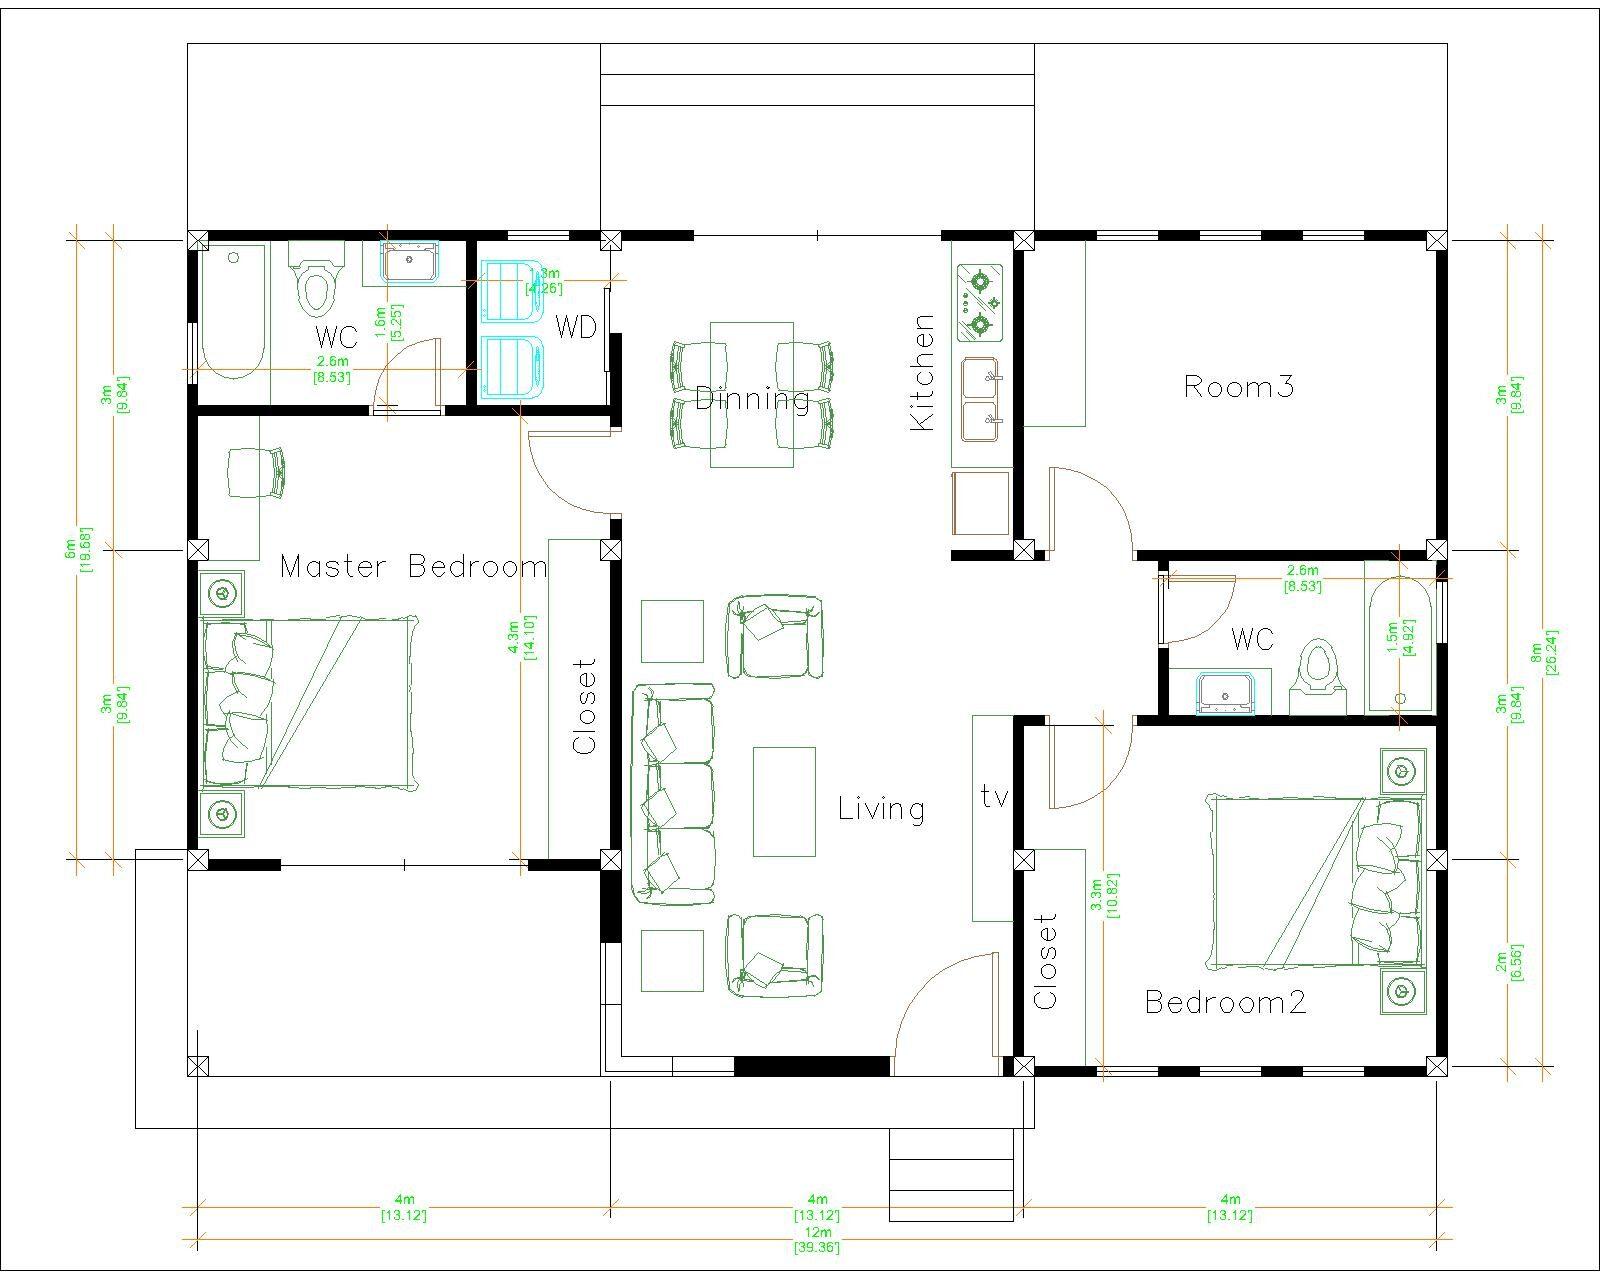 1 Story Modern House 12x12 Meters 40x40 Feet 3 Beds Layout floor plan